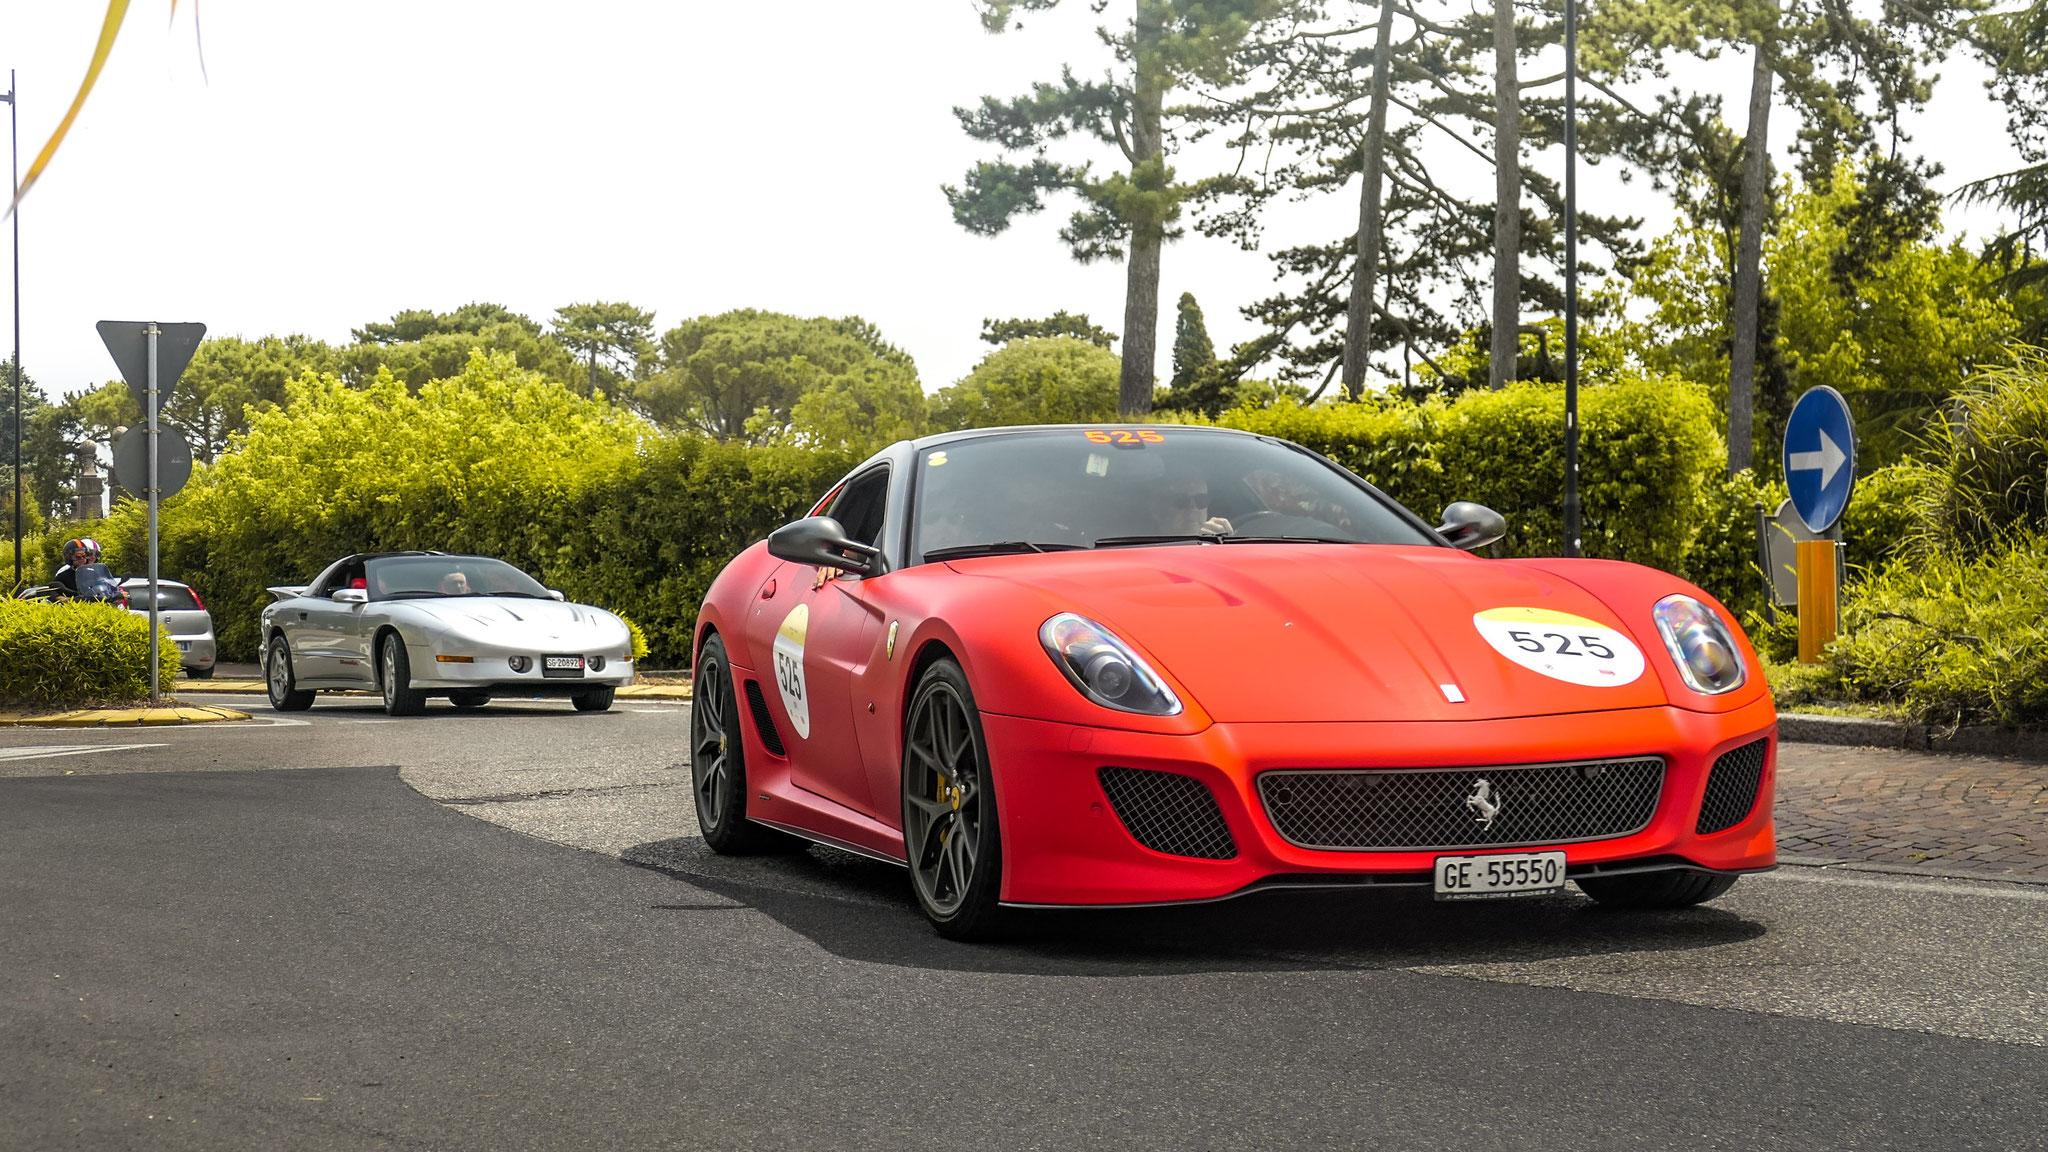 Ferrari 599 GTO - GE-55550 (CH)